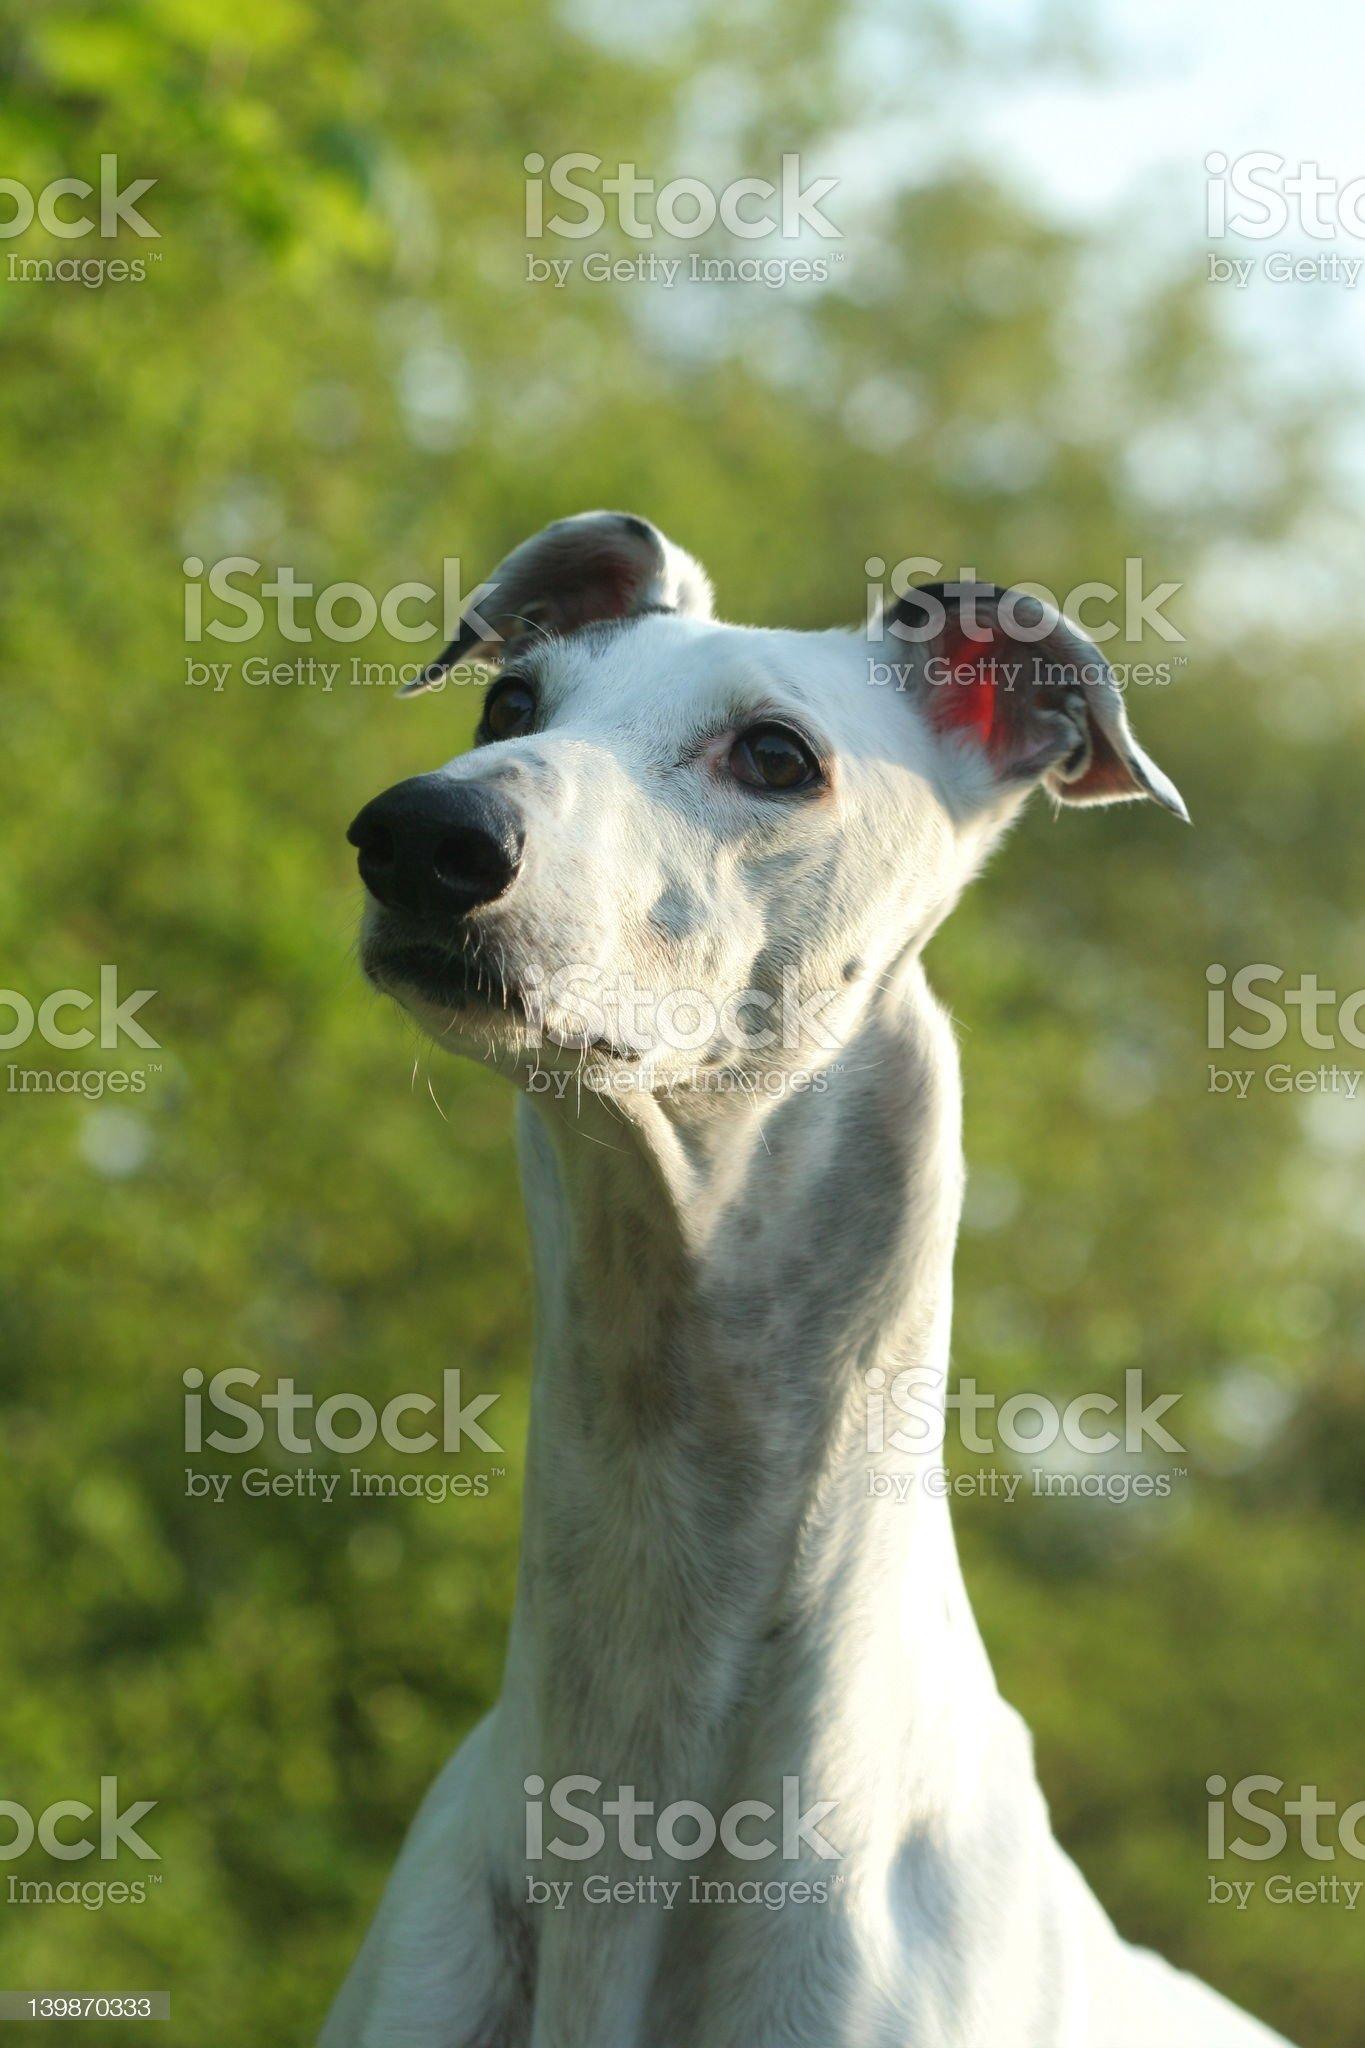 greyhounds portrait royalty-free stock photo